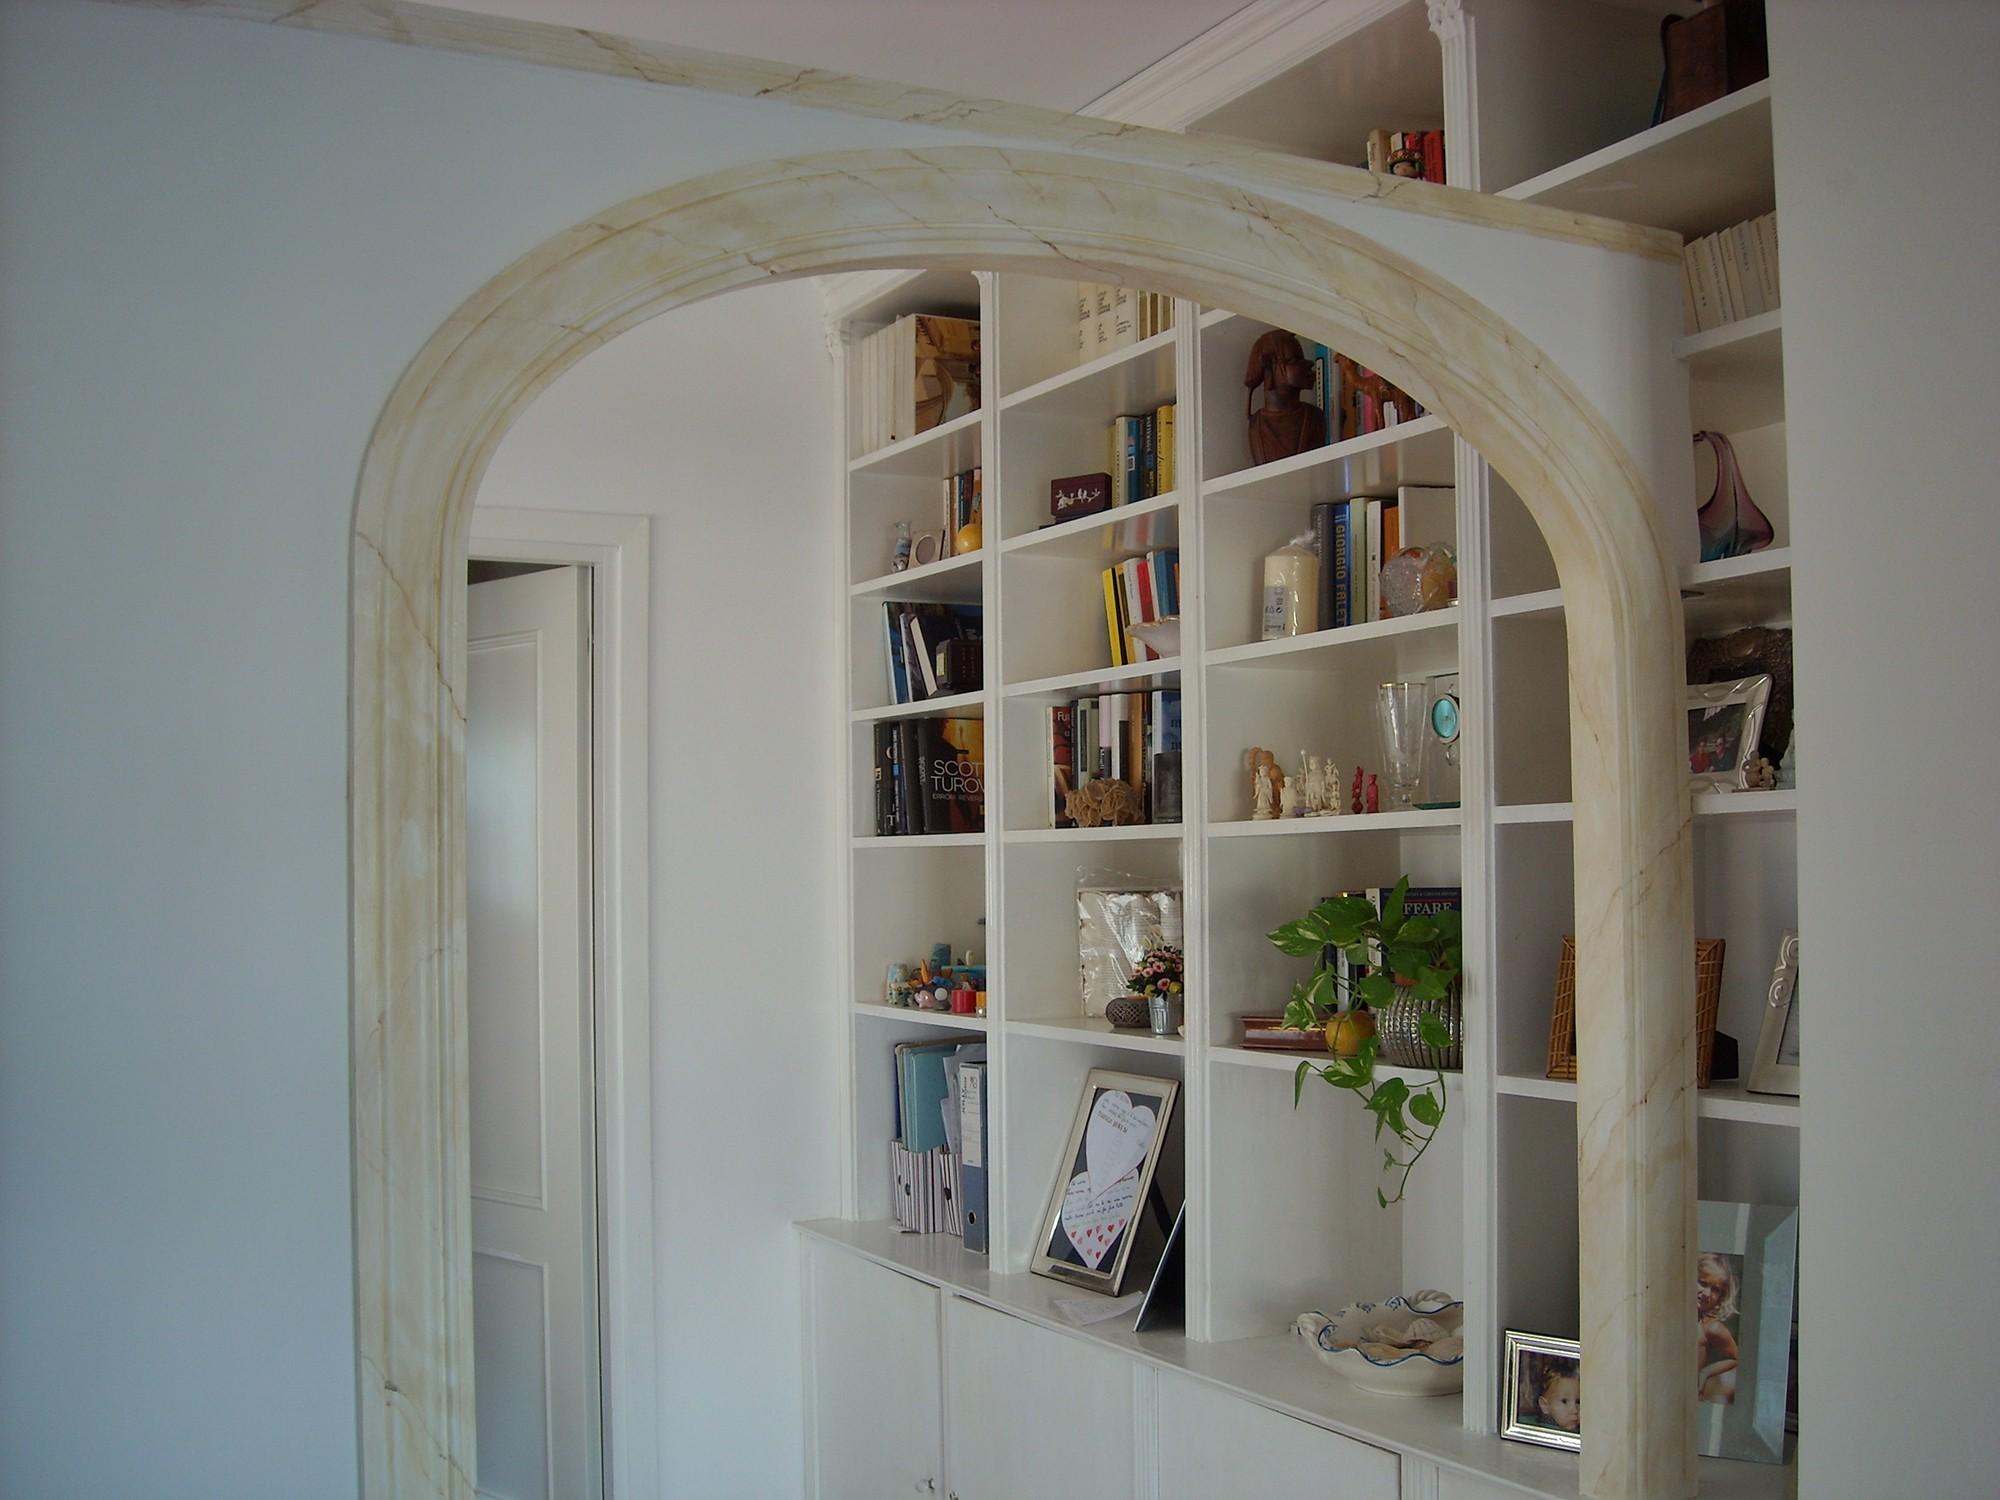 Decorazioni ribichini stucchi produzione stucchi - Stucchi decorativi per interni ...